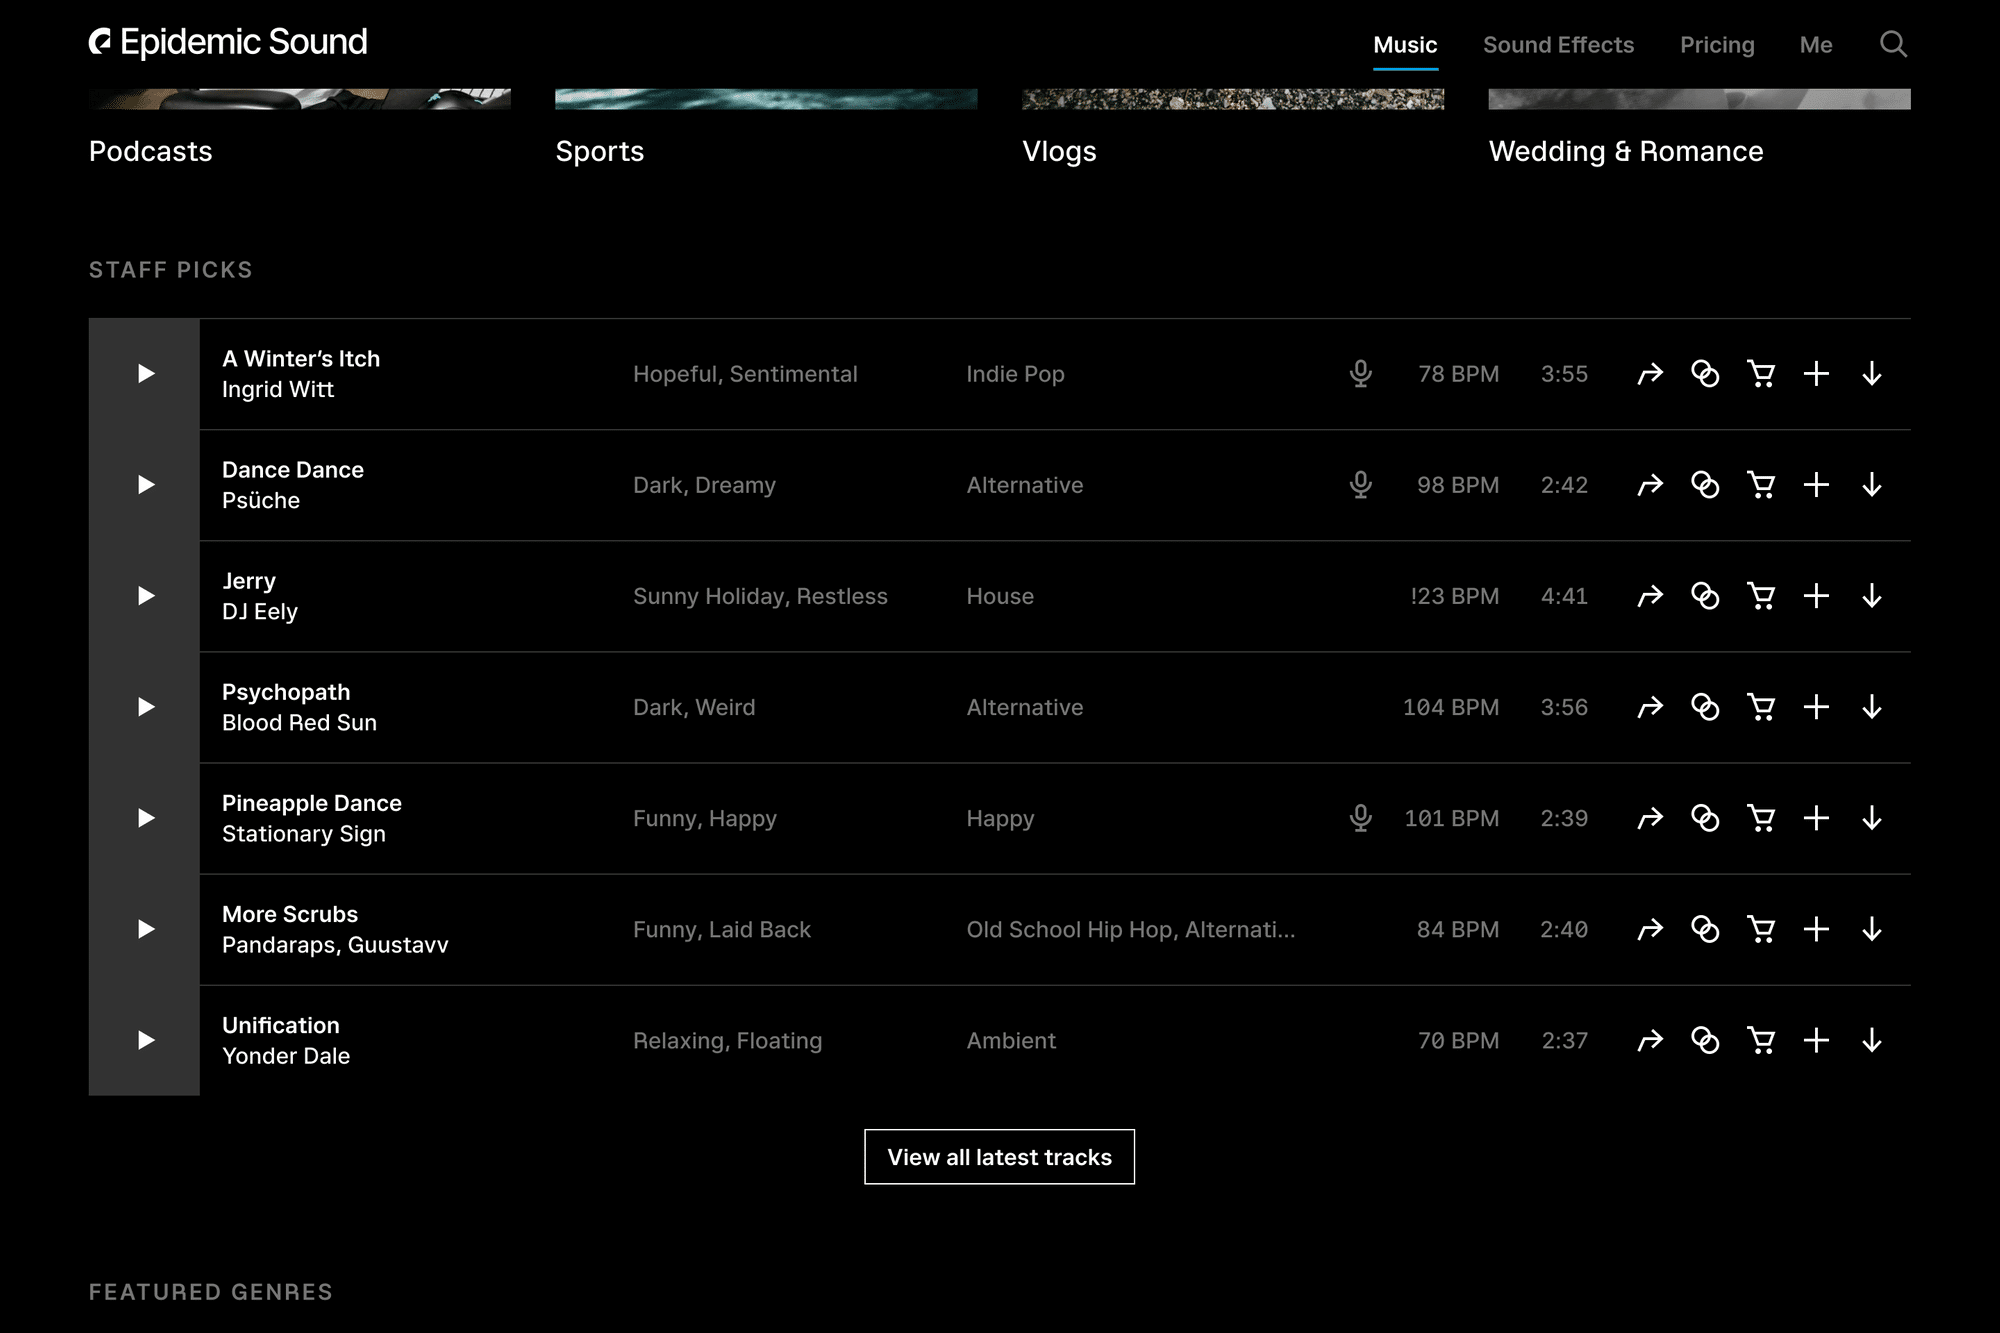 Epidemic-Sound-music